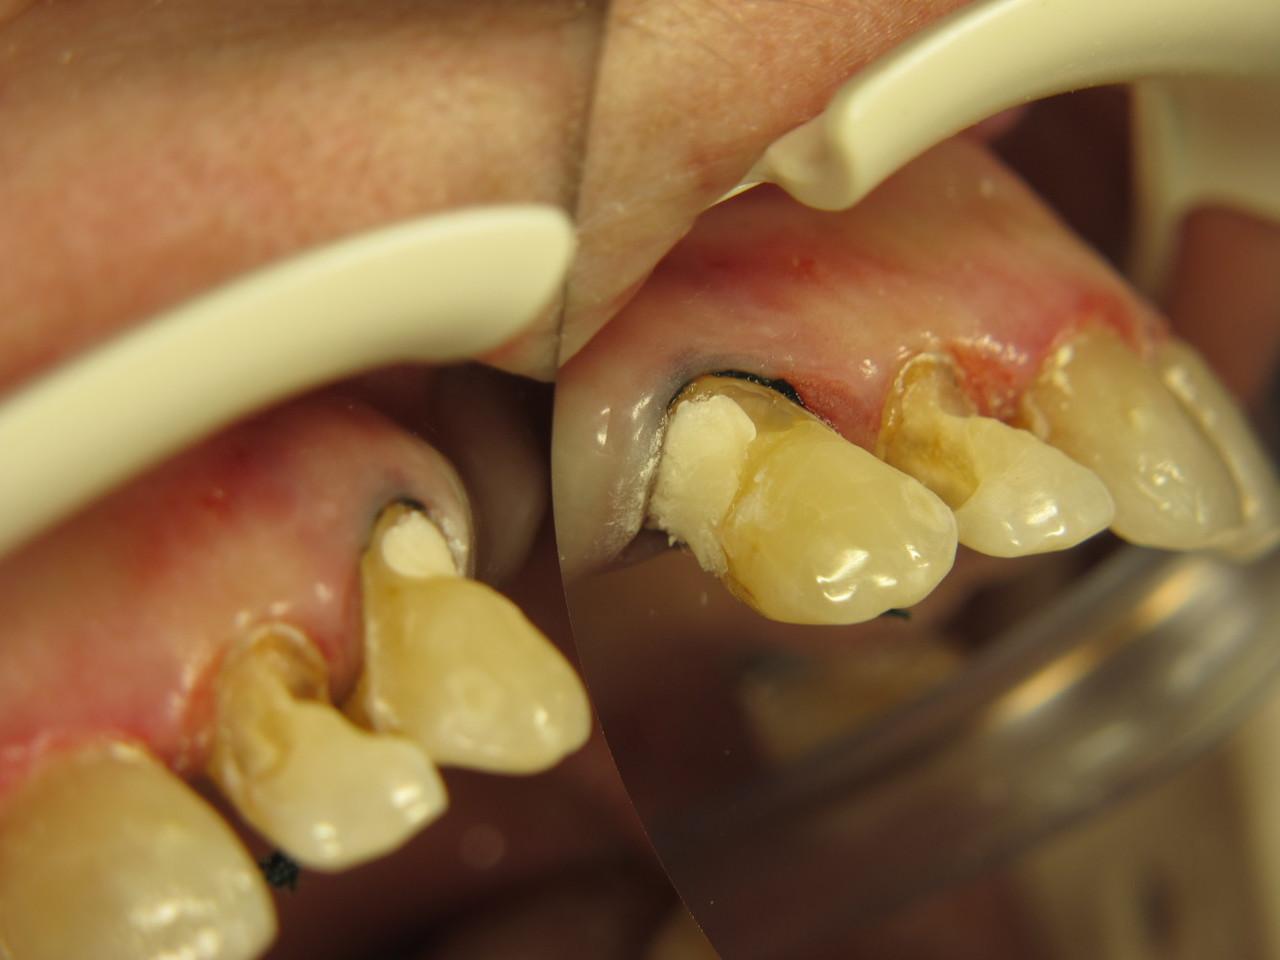 Мне удалили корень зуба не полностью